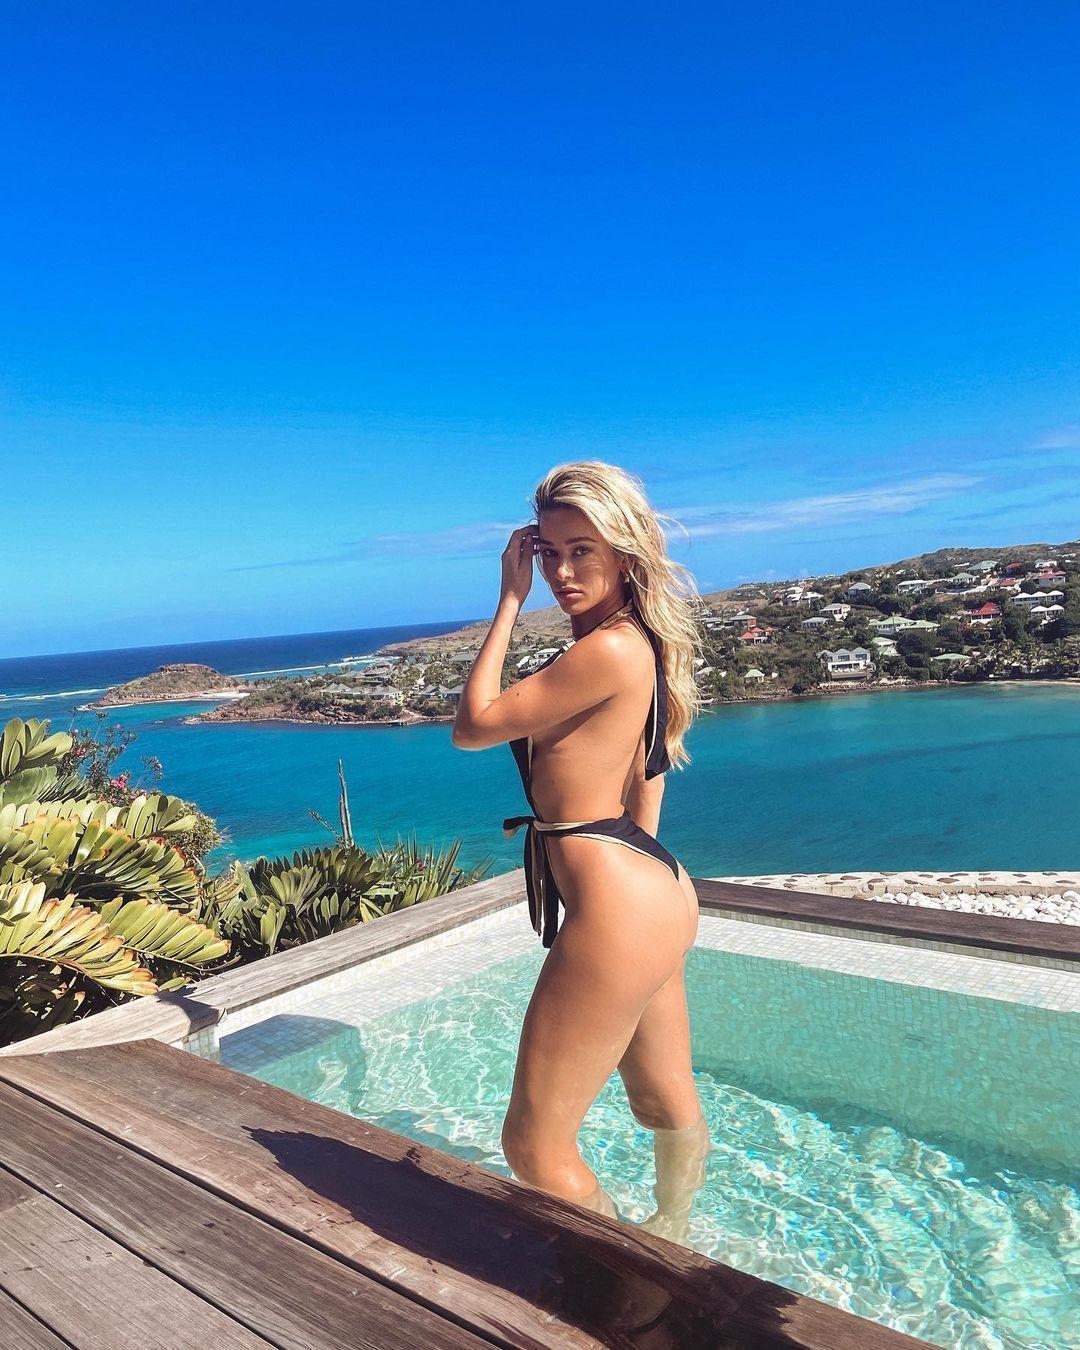 Cindy Prado Beautiful In Swimsuit